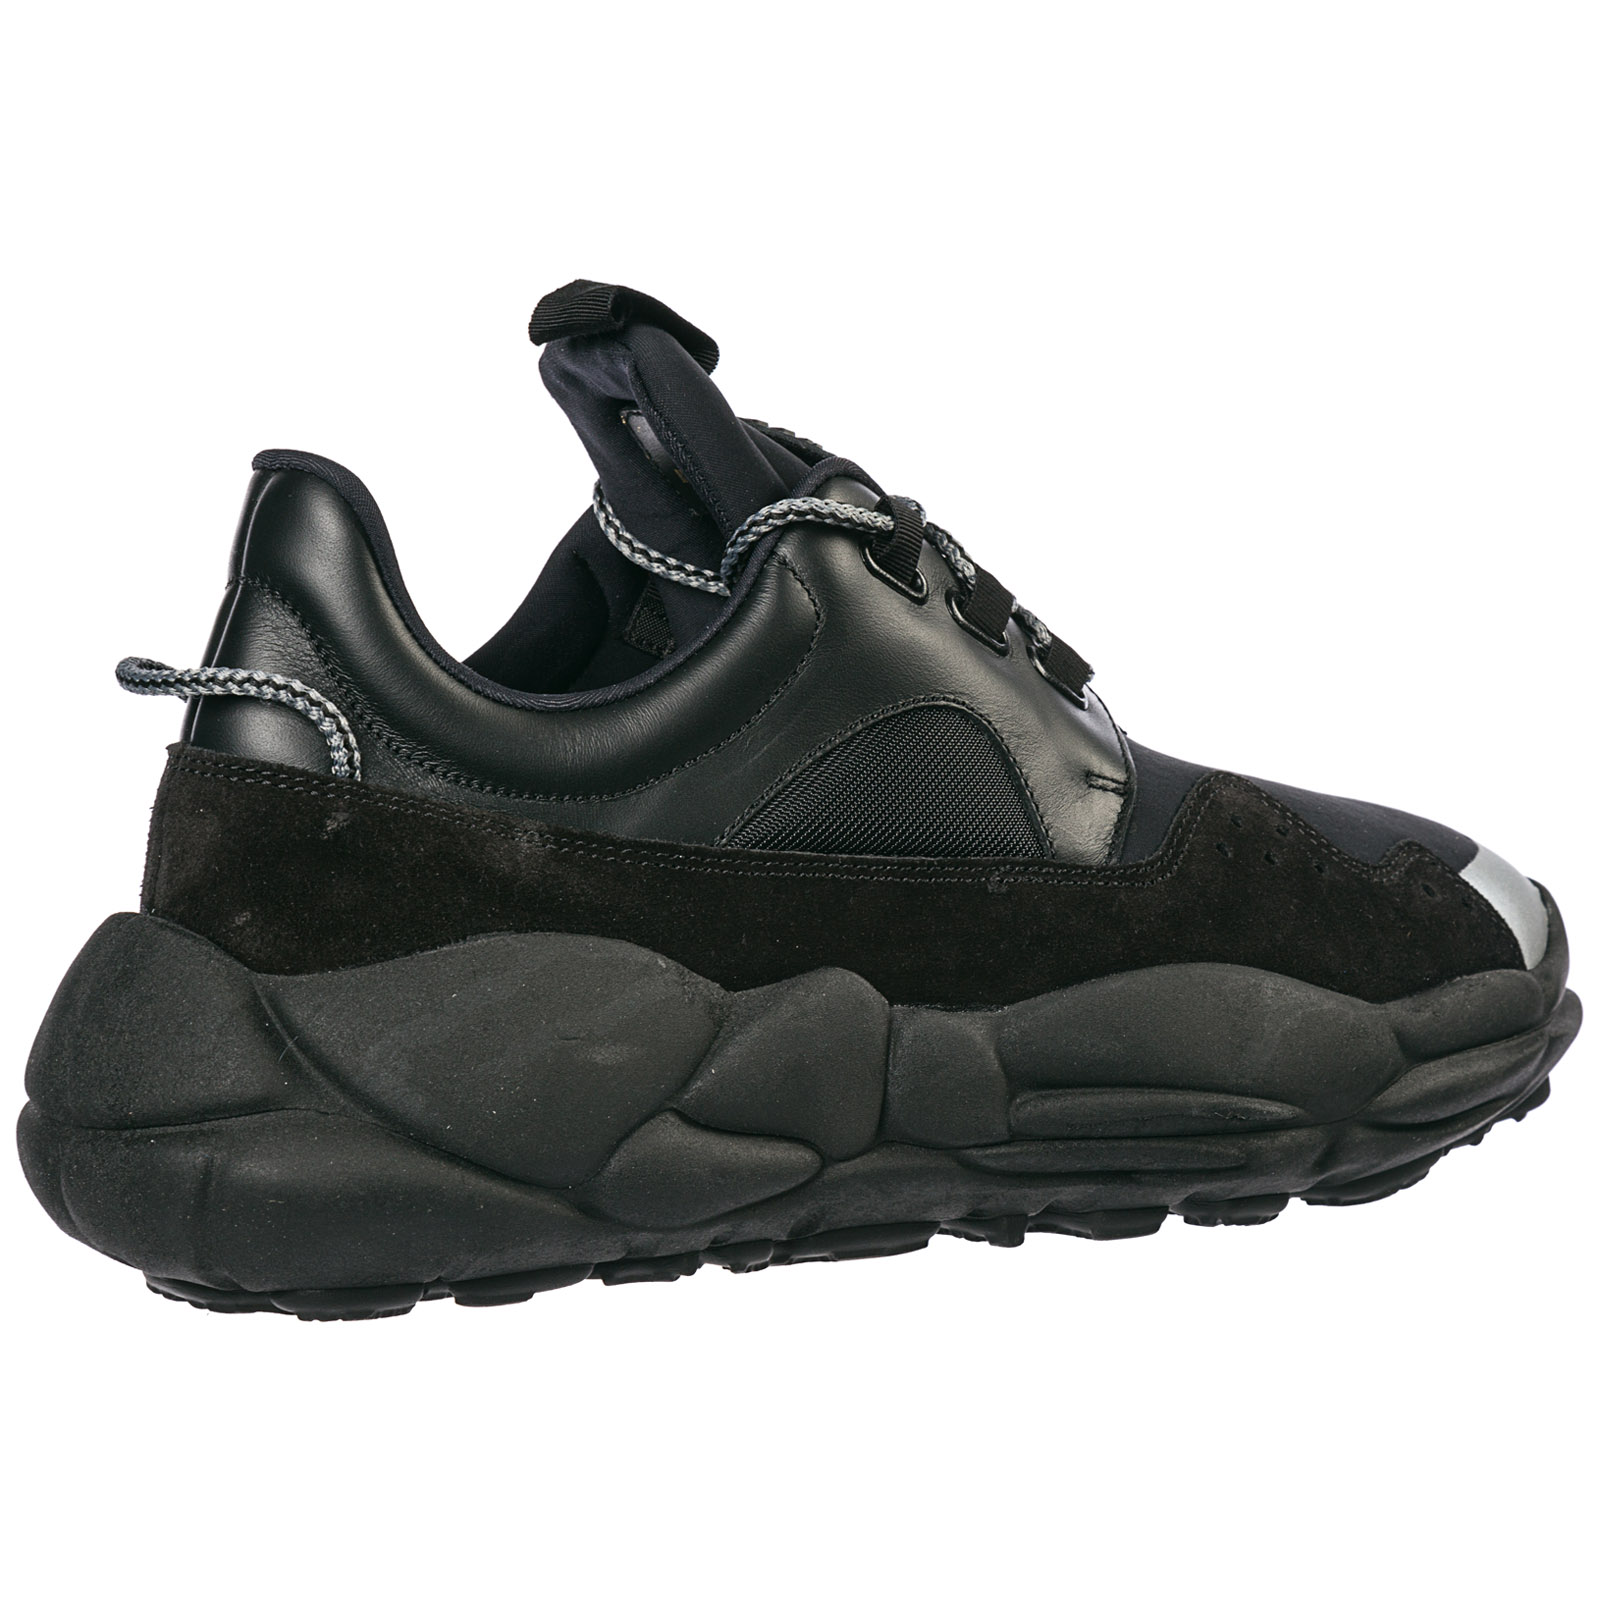 199368dcd23 ... Chaussures baskets sneakers homme en cuir anatomia ...